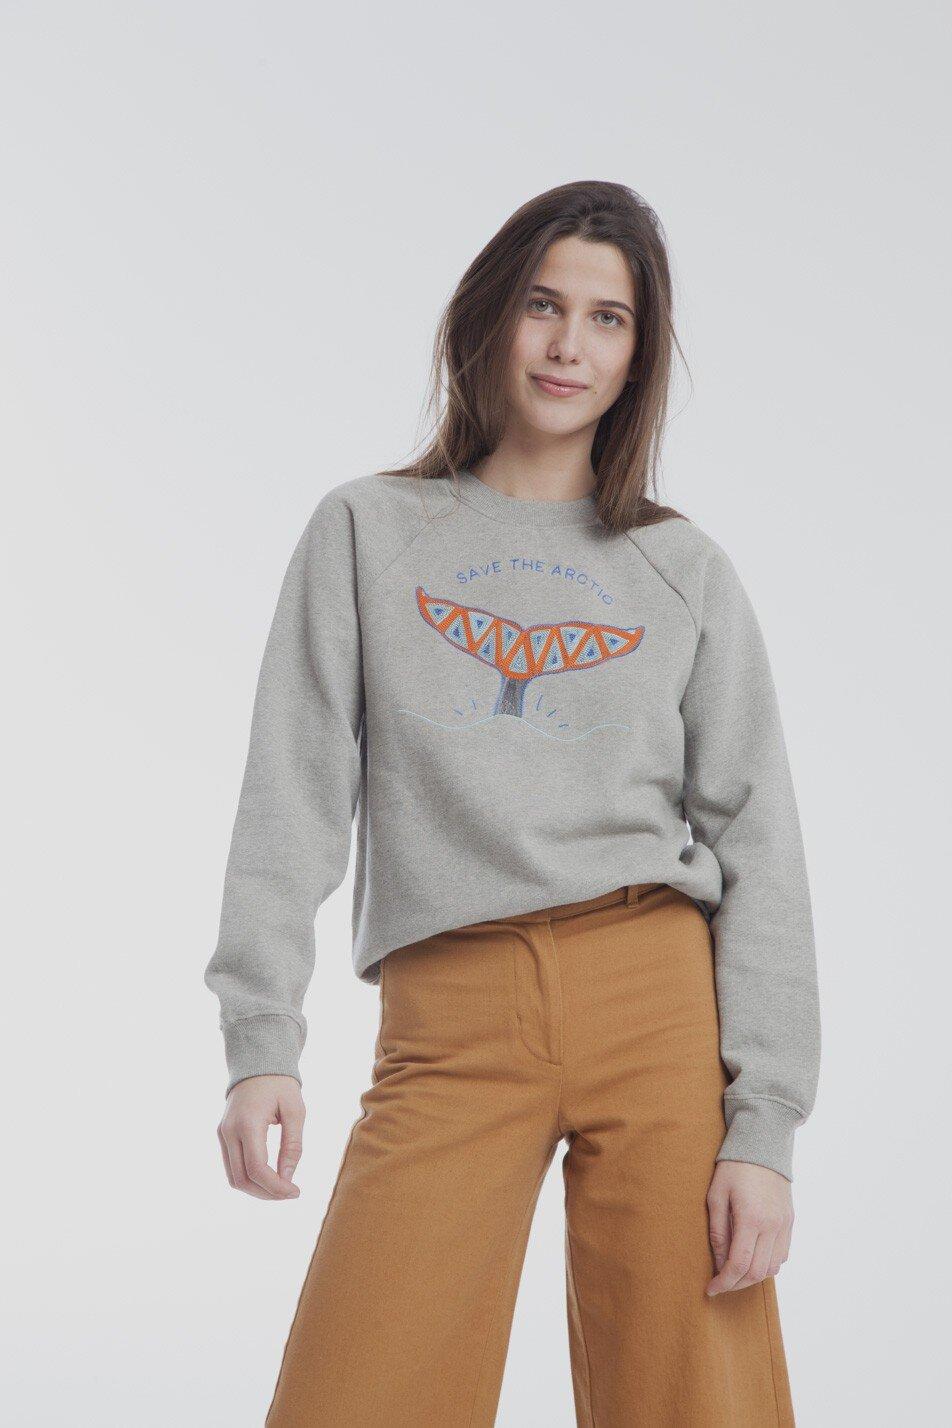 artic-raglan-sweatshirt.jpg